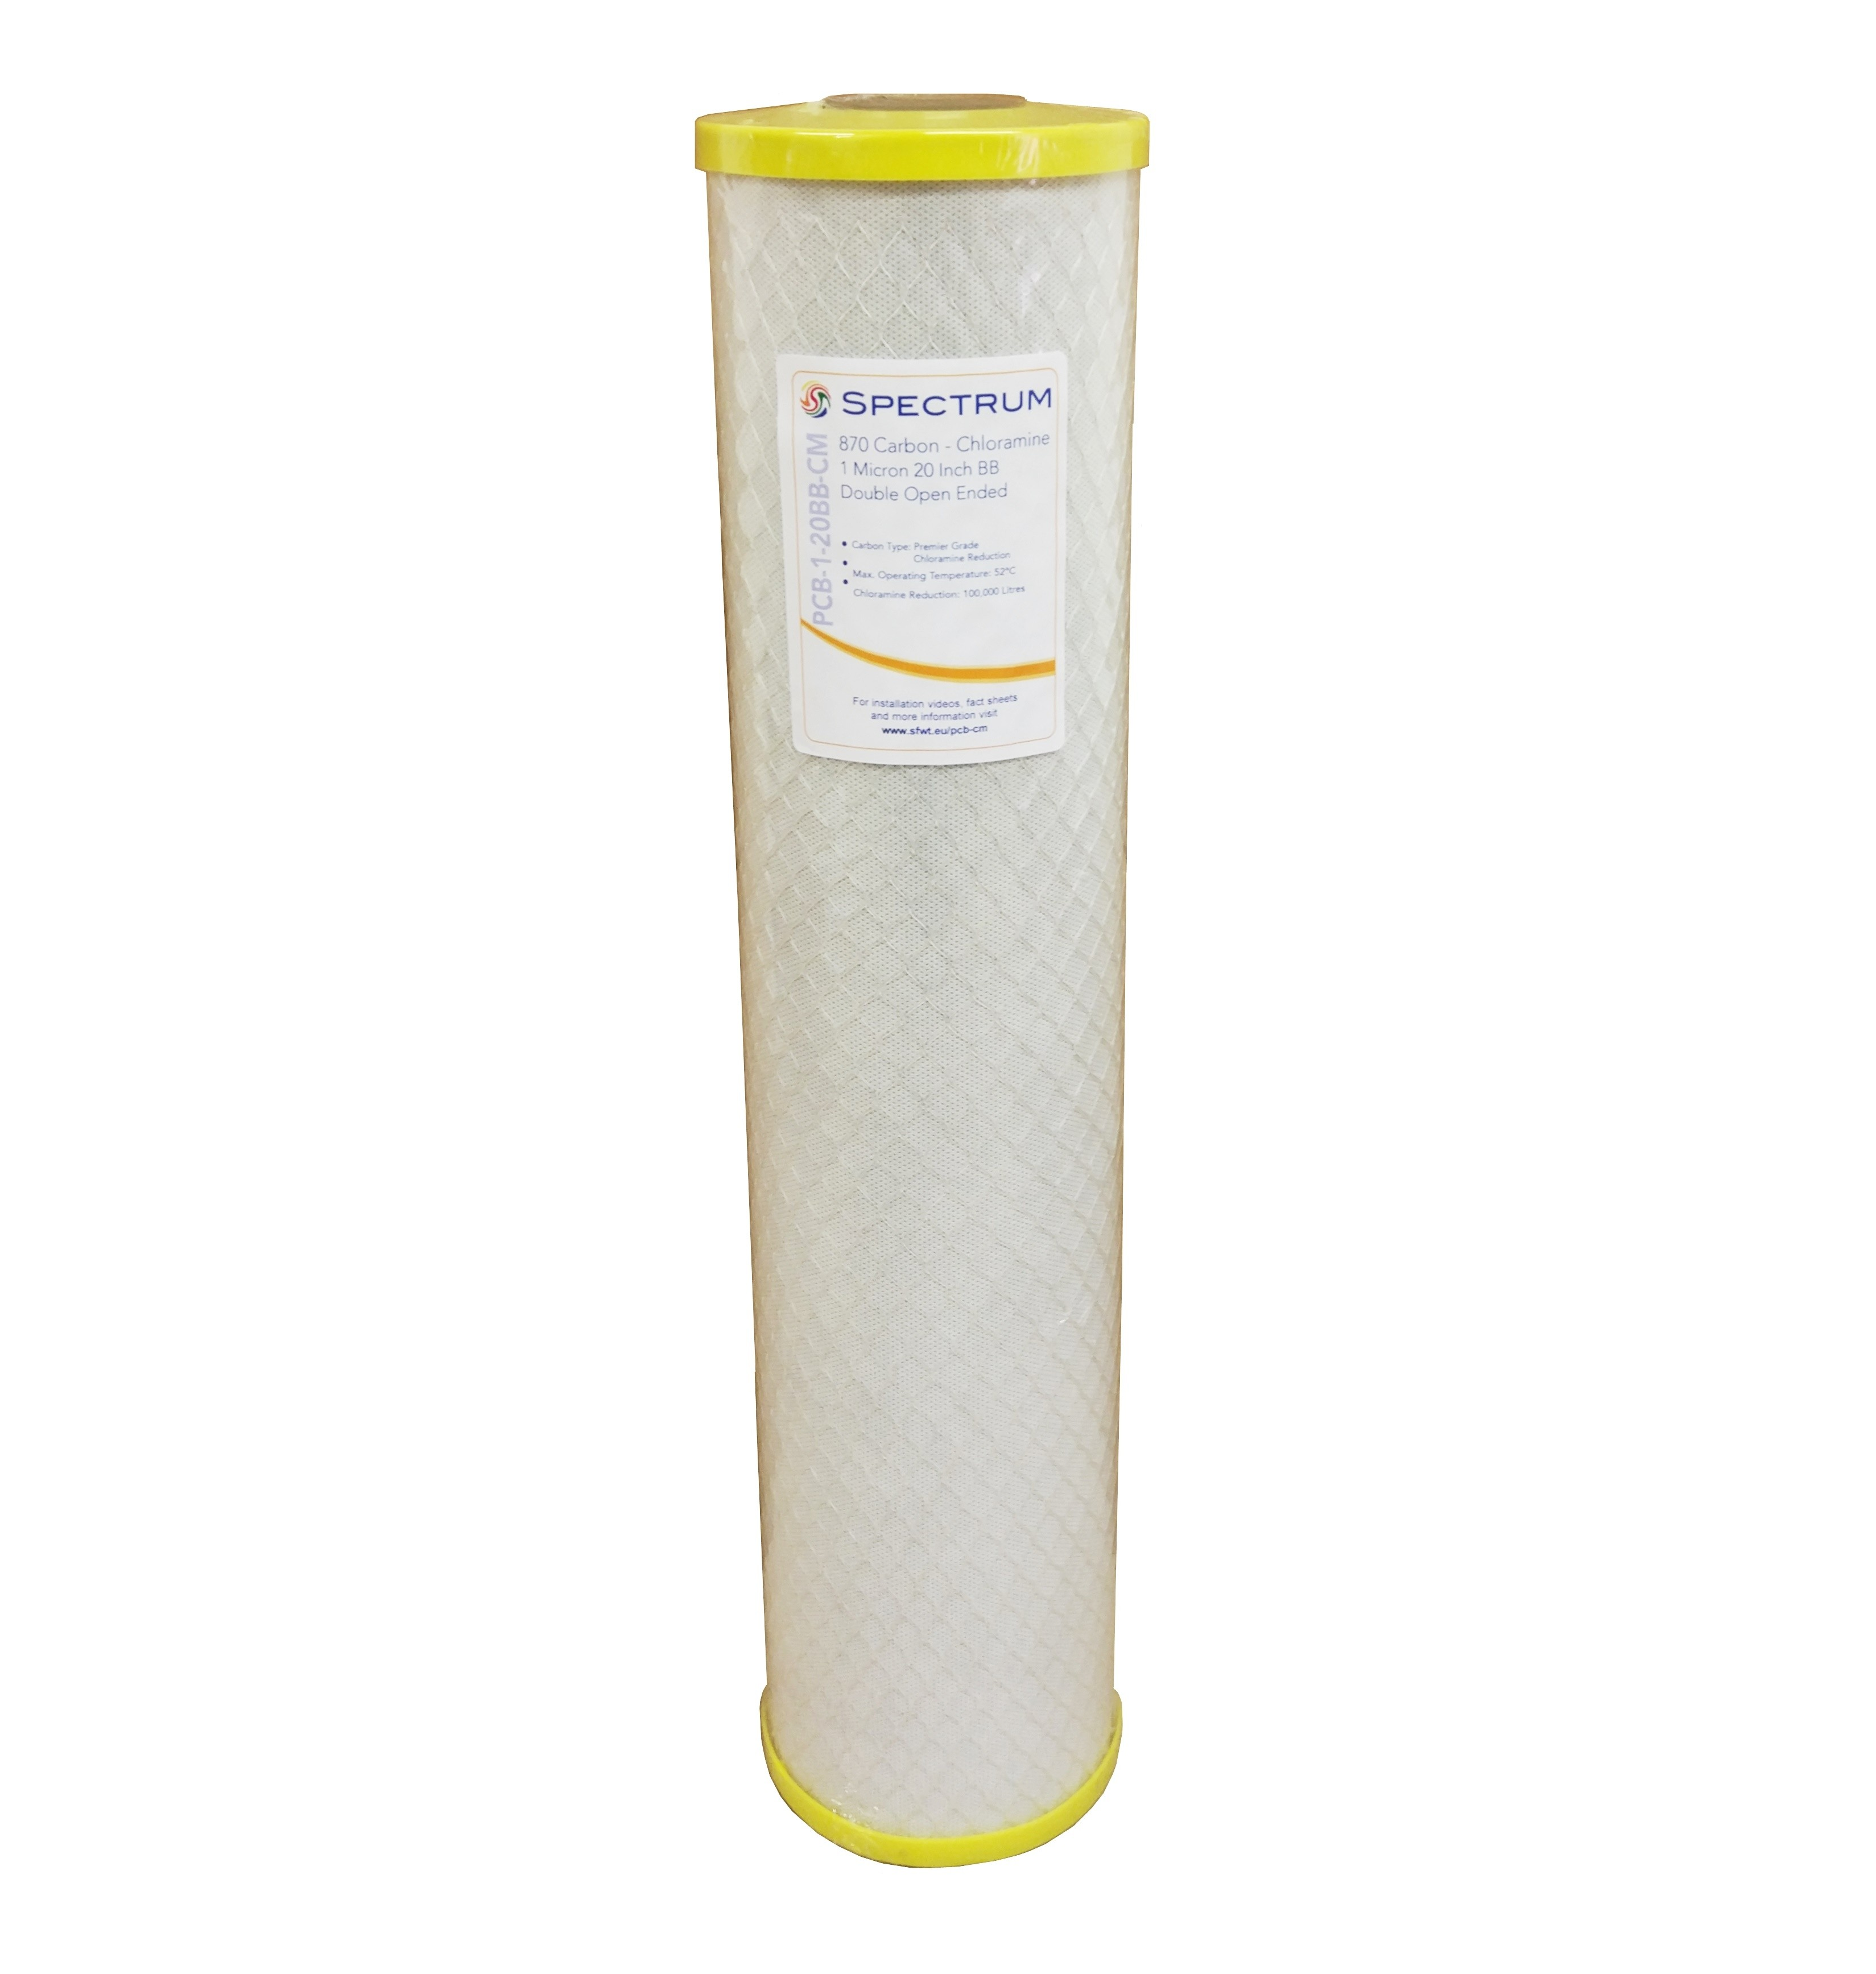 "Spectrum PCB 20"" Jumbo Premier 1 Micron Carbon Block Water Filter"